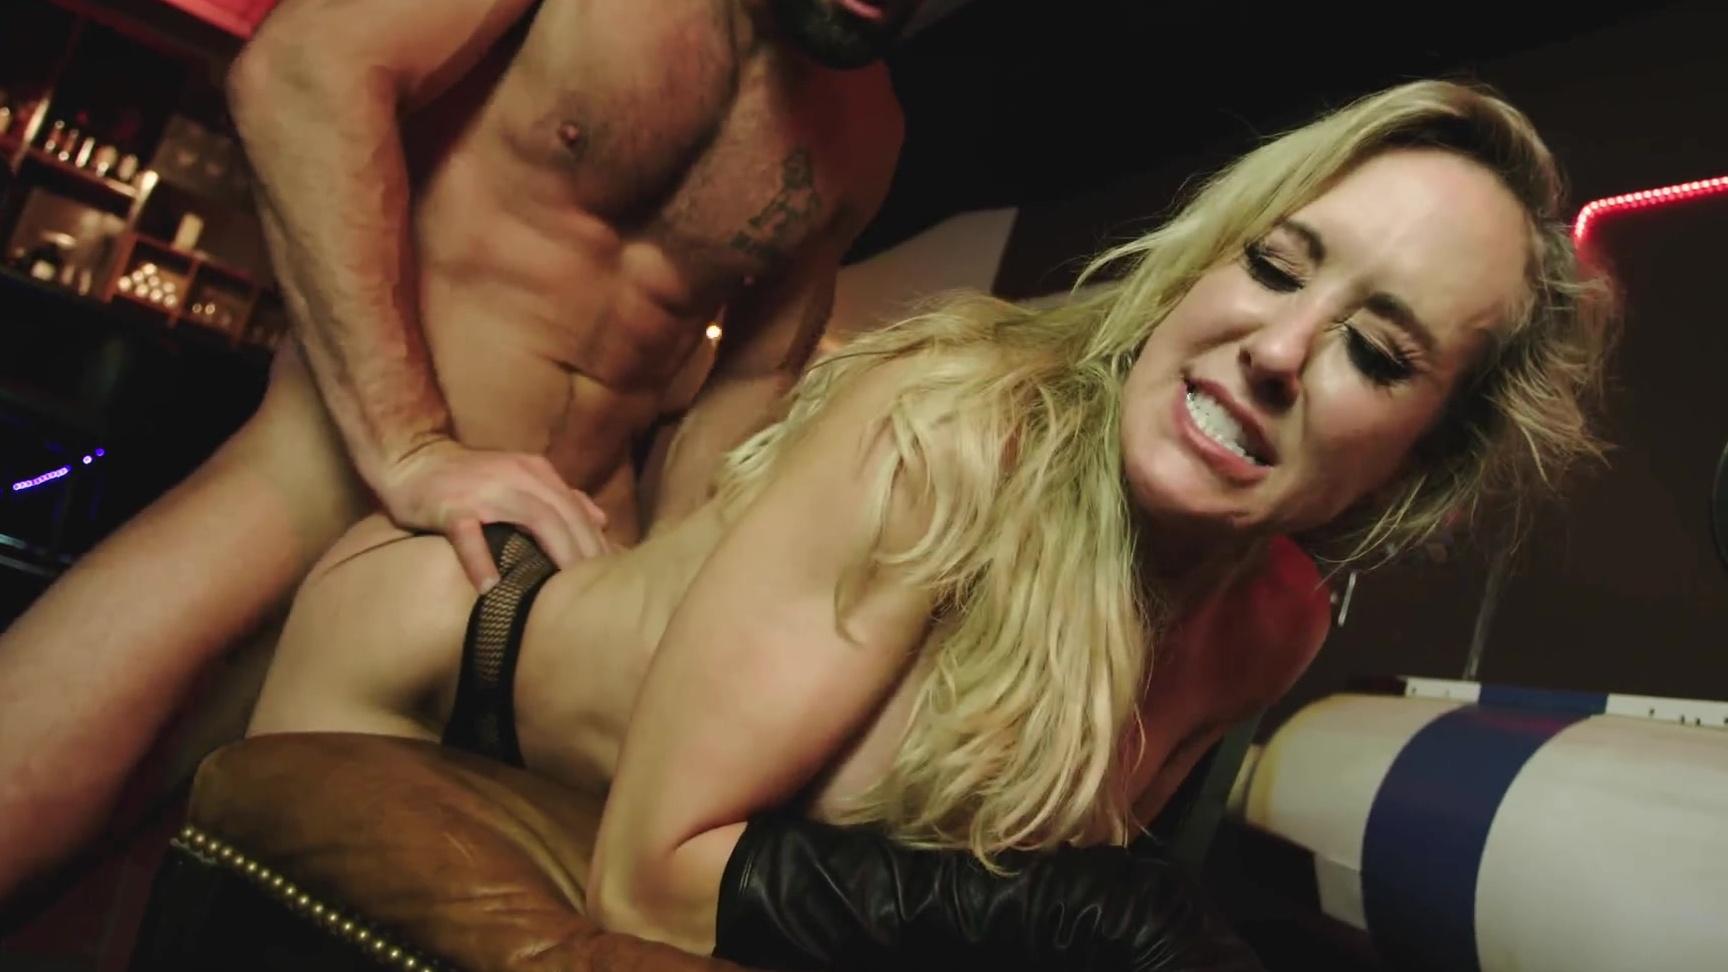 Xxx fuck mom tube videos free mature sex hot milf porn abuse